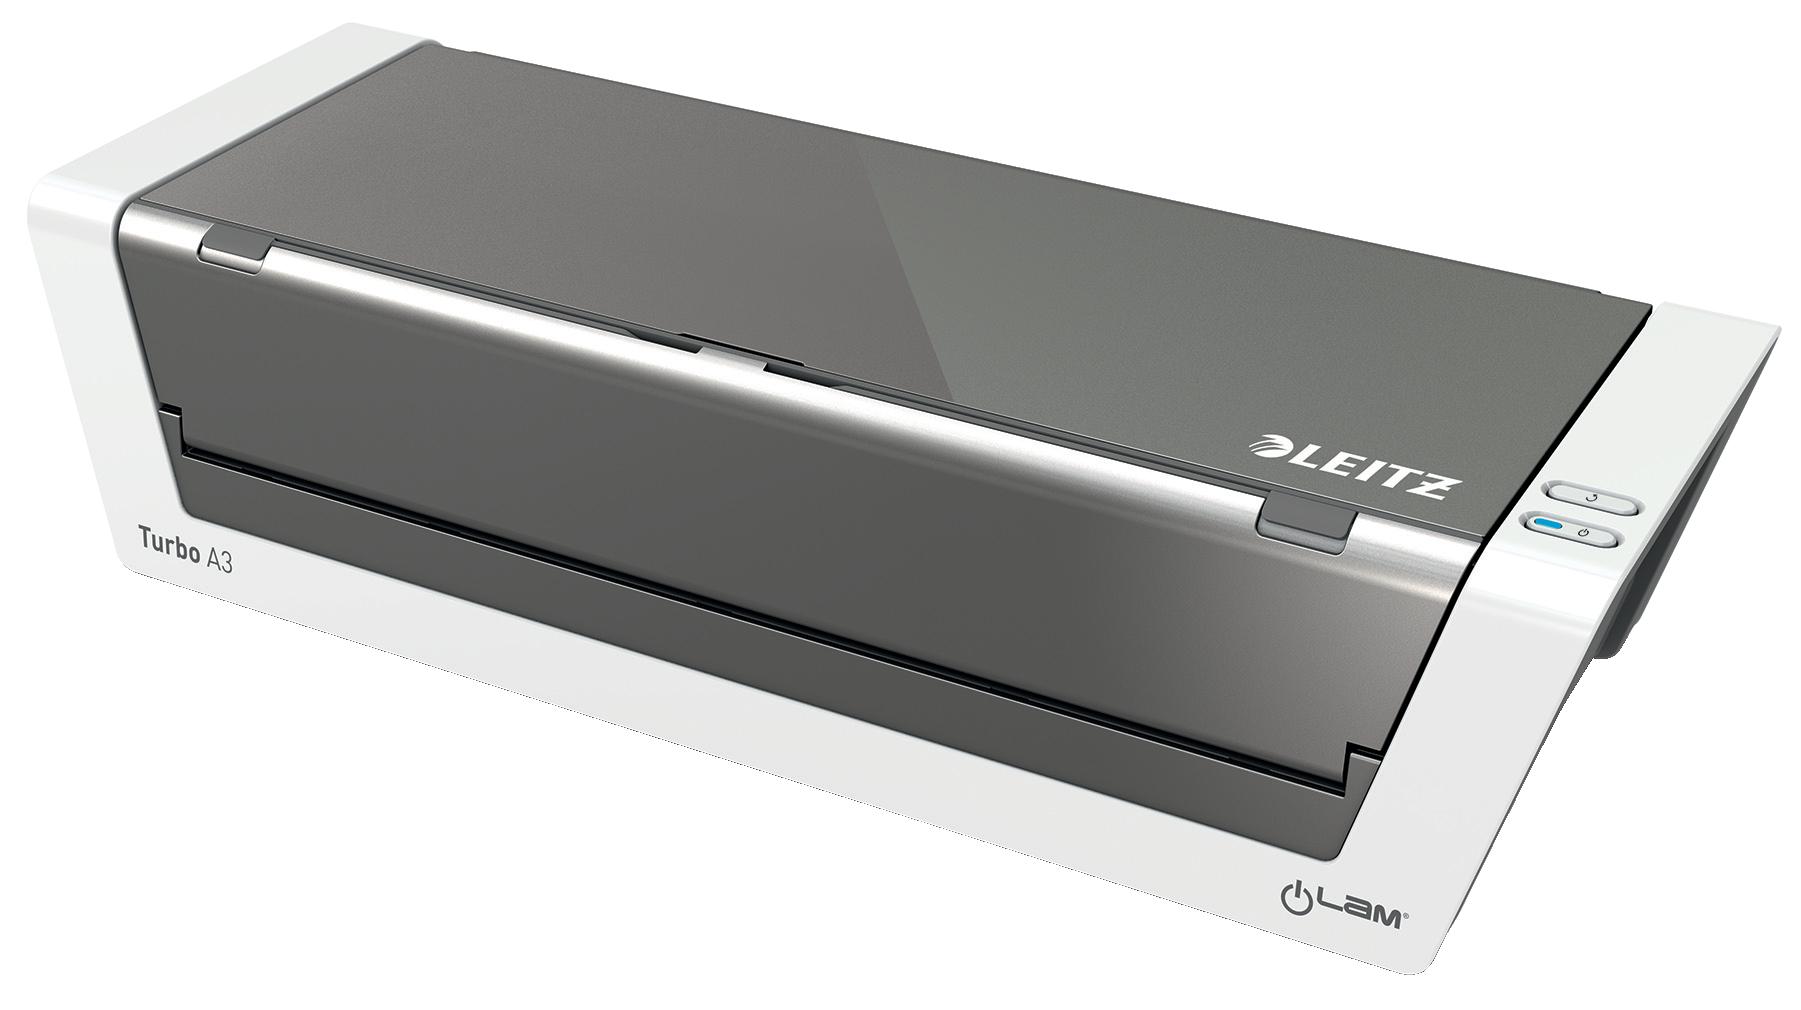 Leitz iLAM Touch Turbo2 A3 Laminator